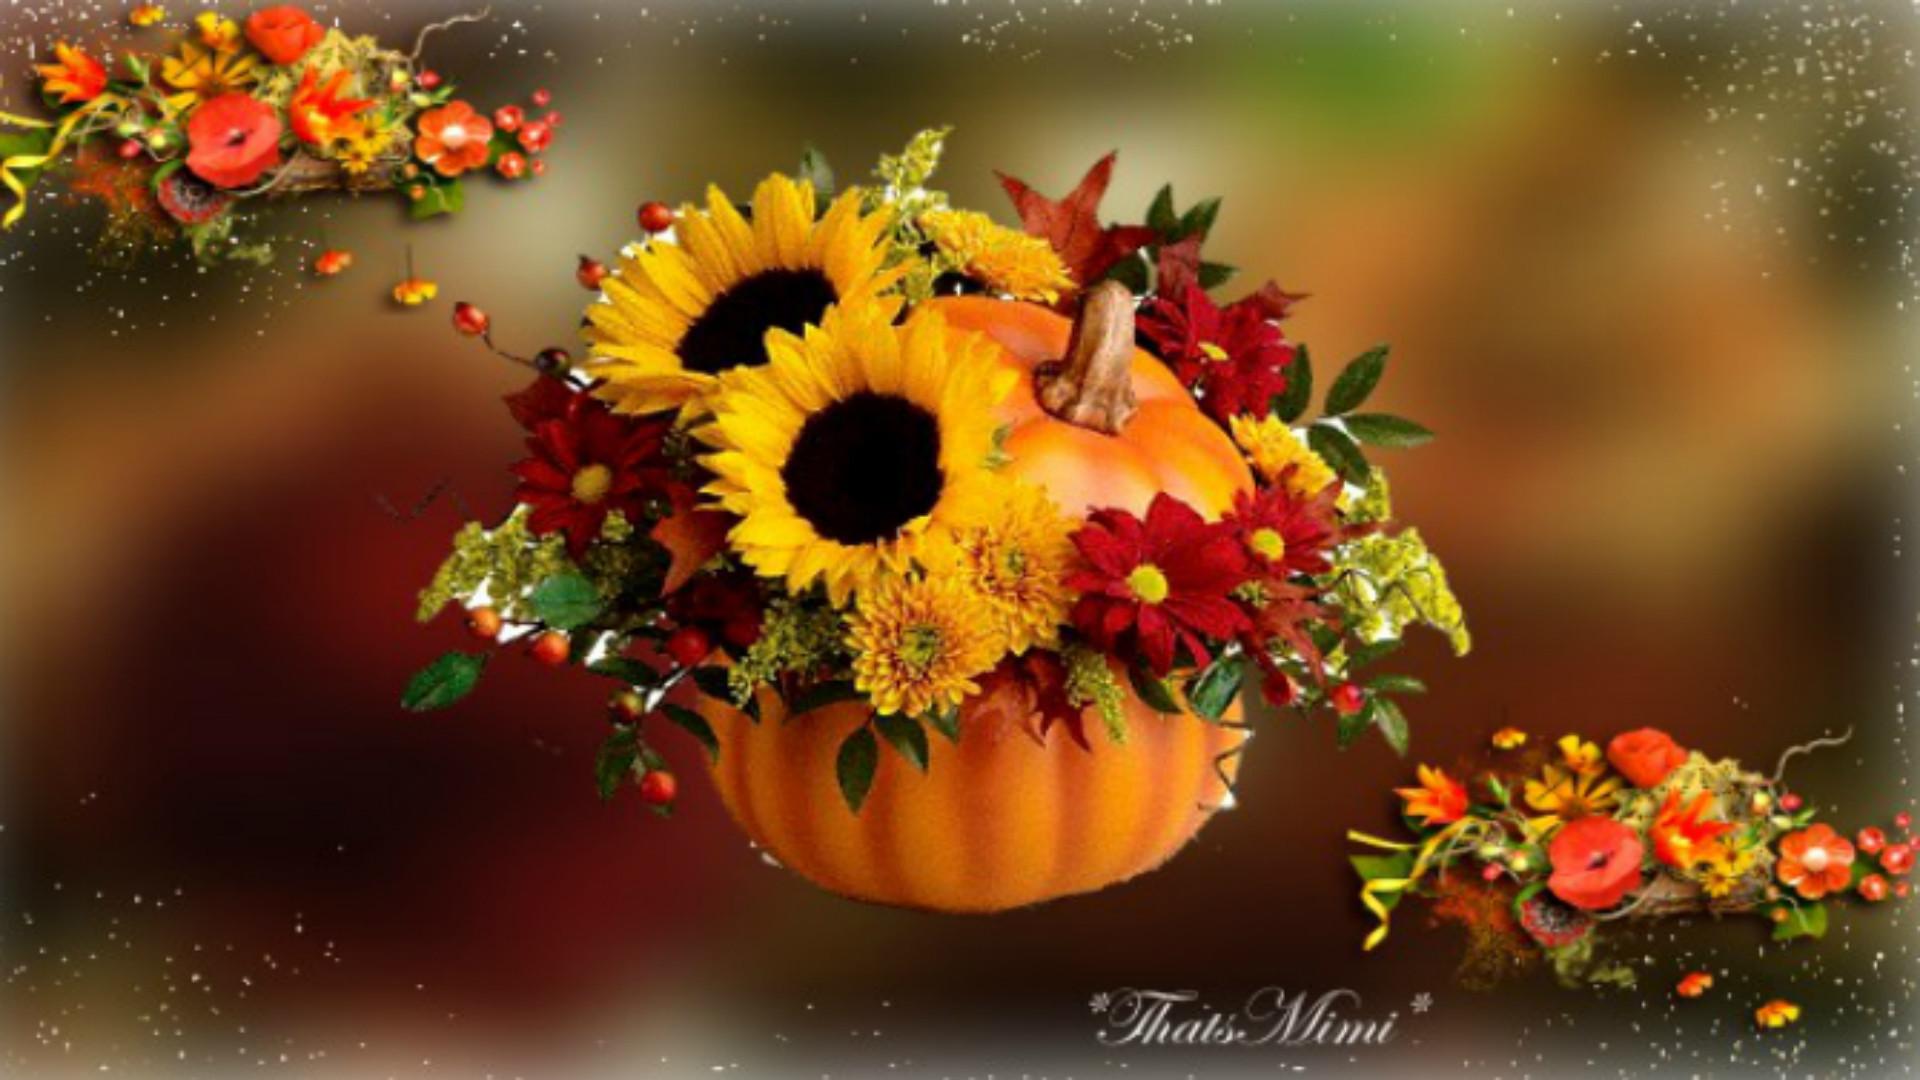 Fall Flowers Desktop Background 143466 Hd Wallpaper Backgrounds Download